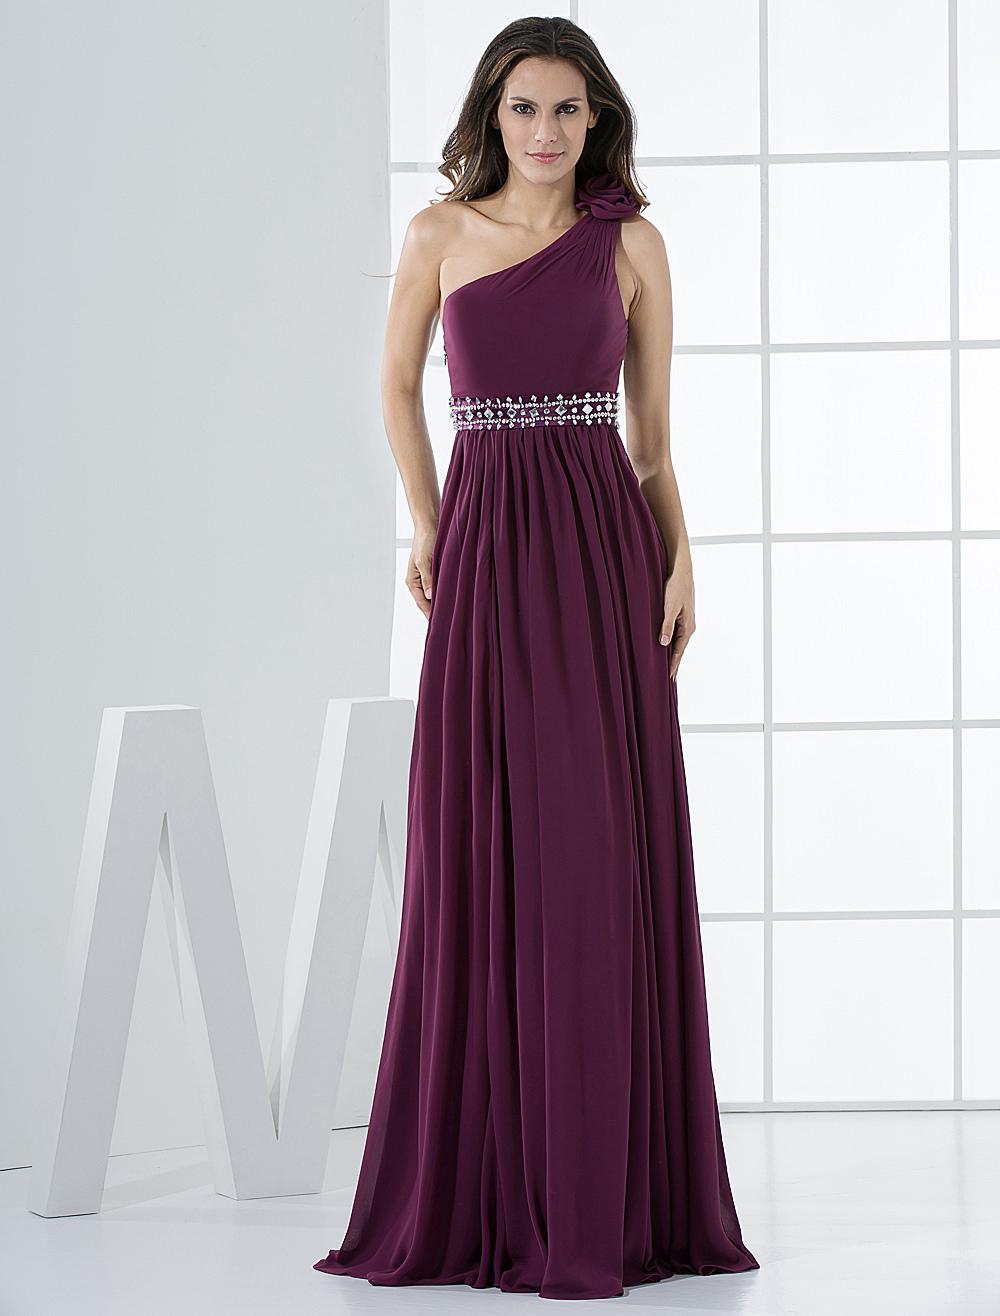 Grape Elegant A-line Rhinestone One-Shoulder Long Evening Dress (Wedding Evening Dresses) photo